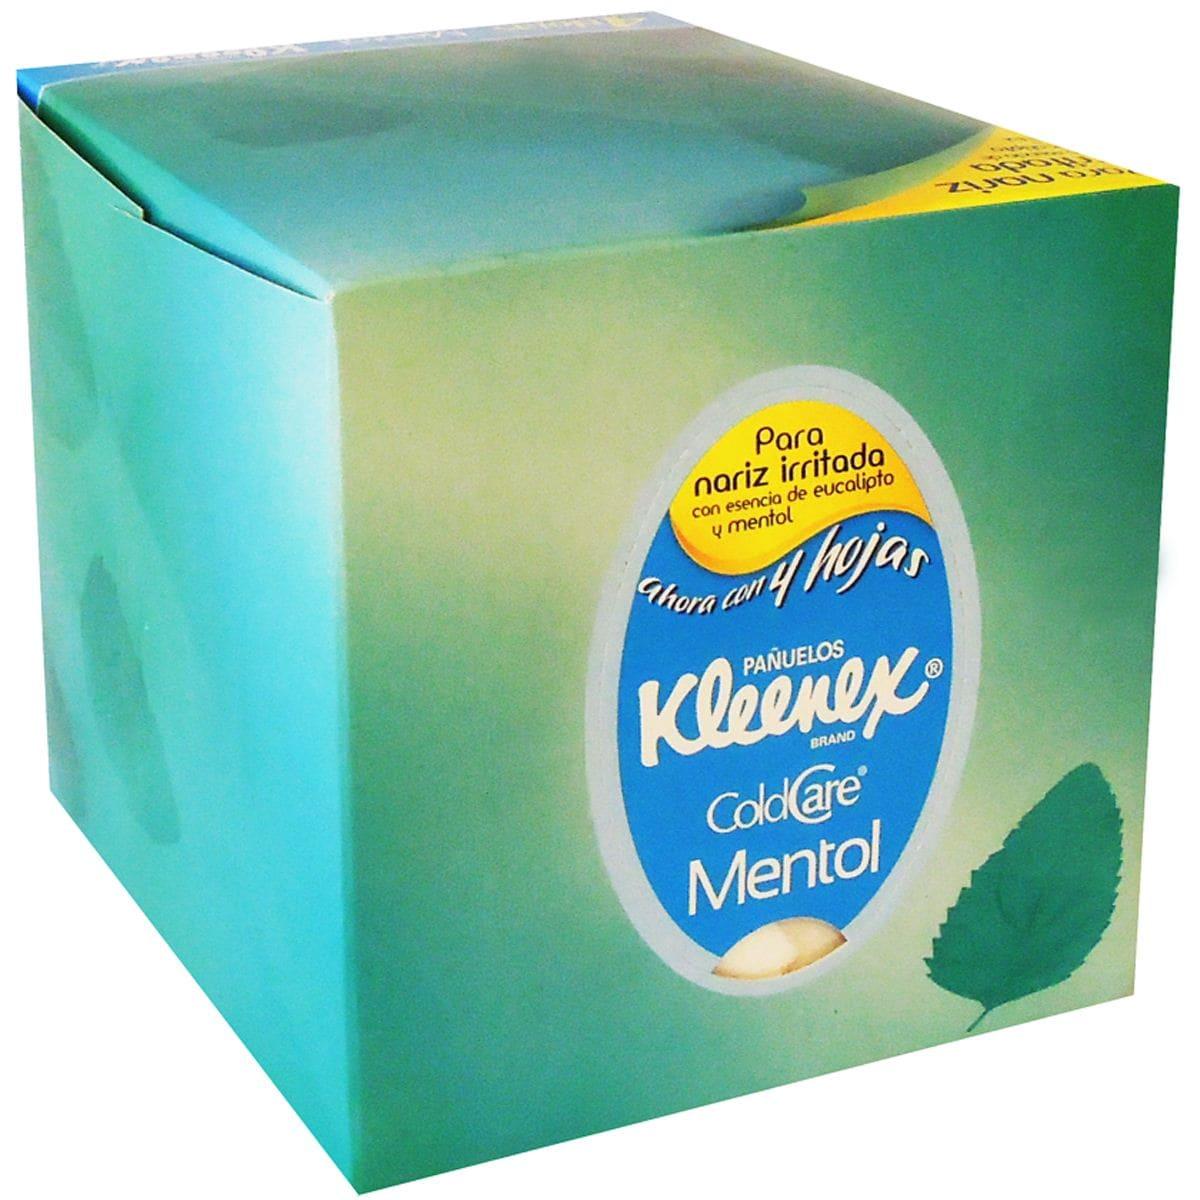 Kleenex Cold Care Mentol